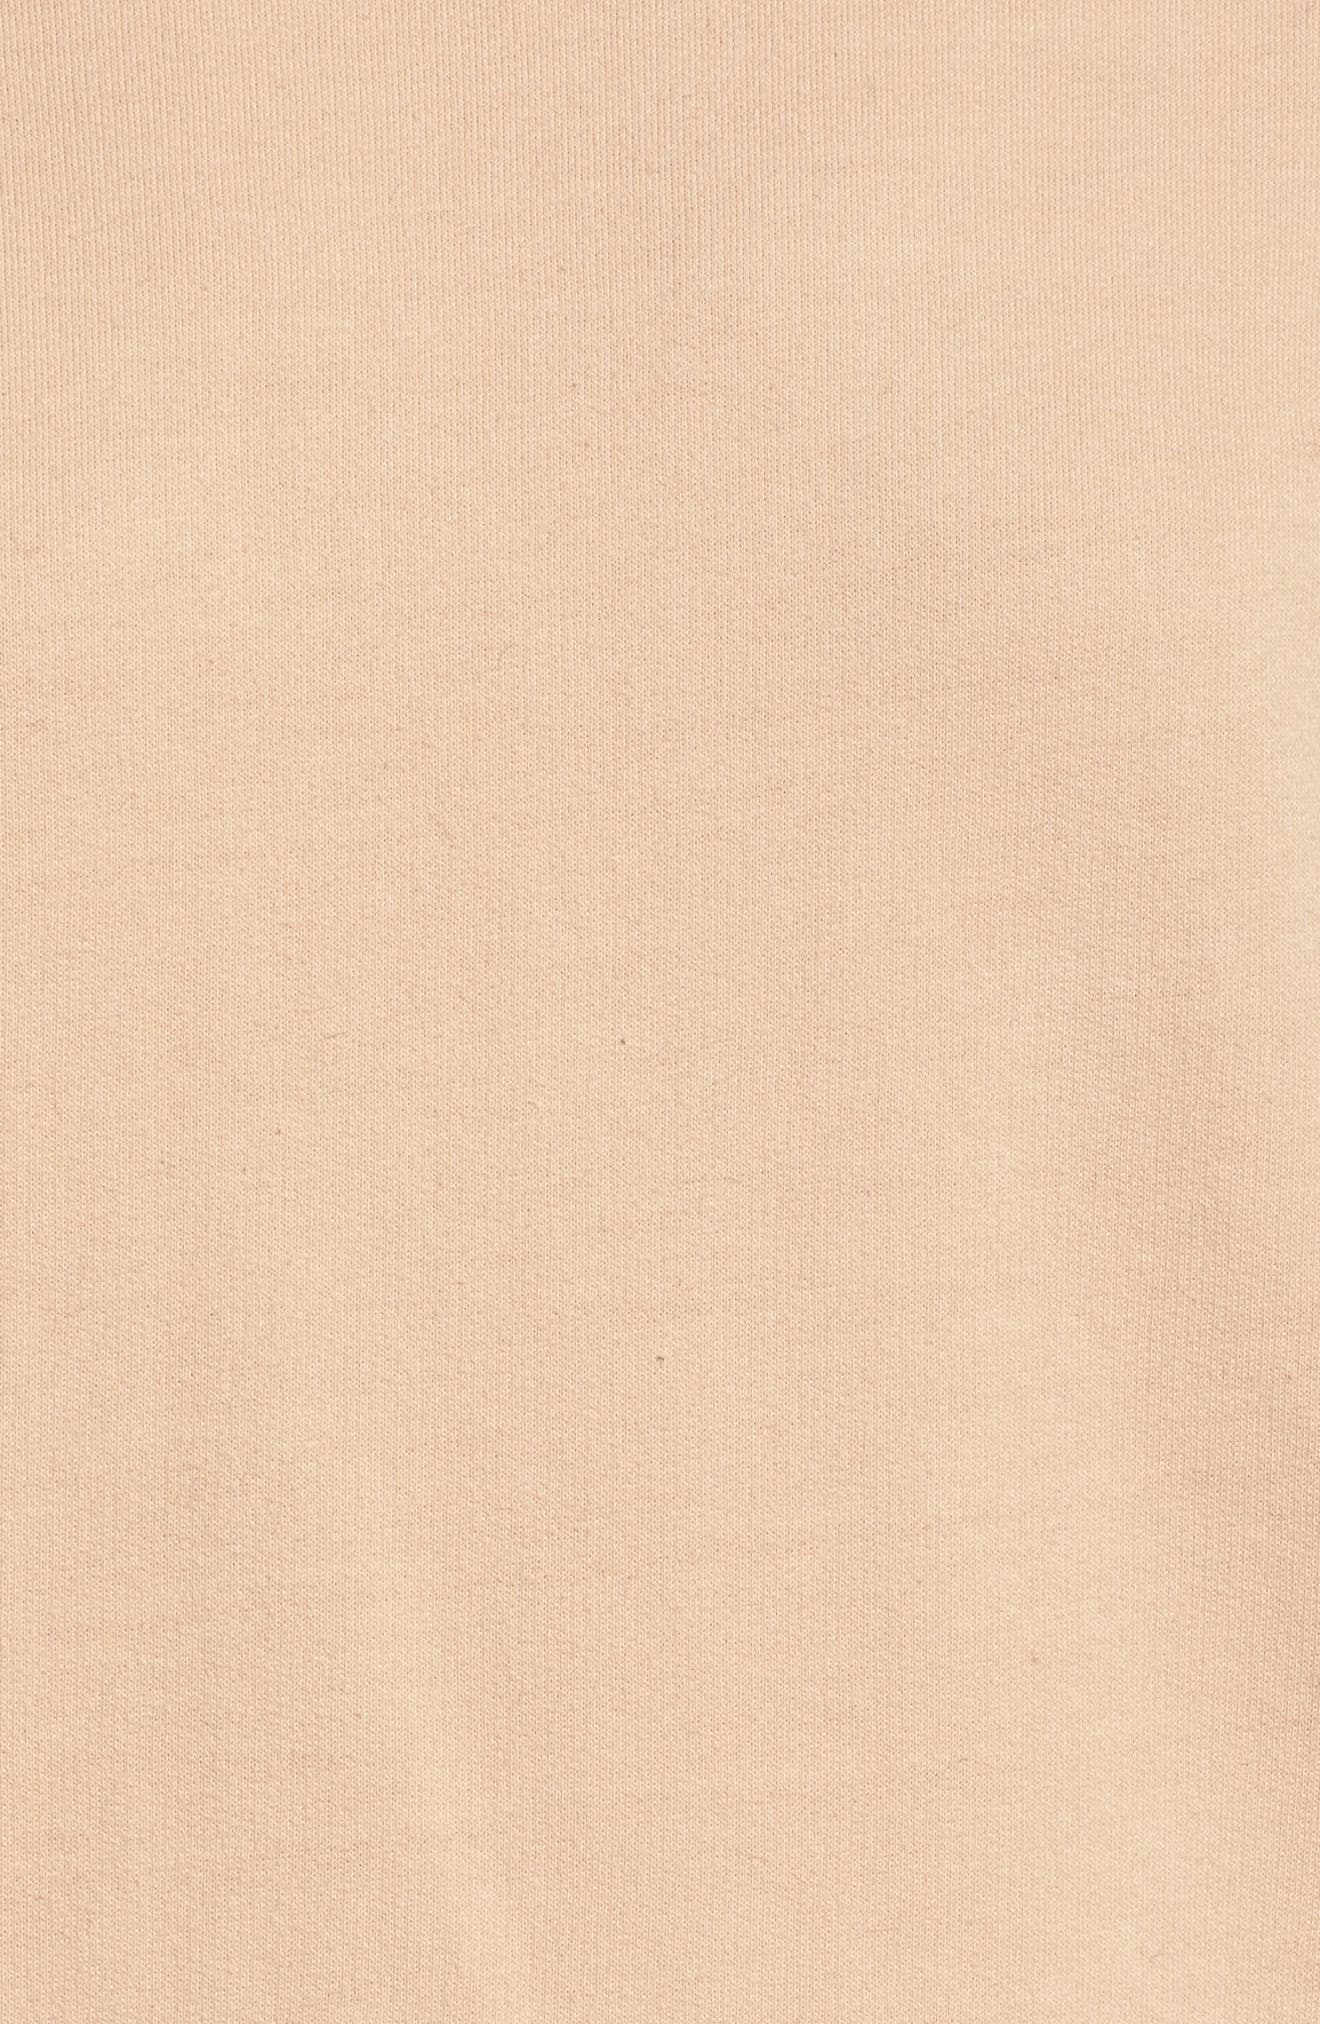 Sweatshirt Dress,                             Alternate thumbnail 5, color,                             Nude